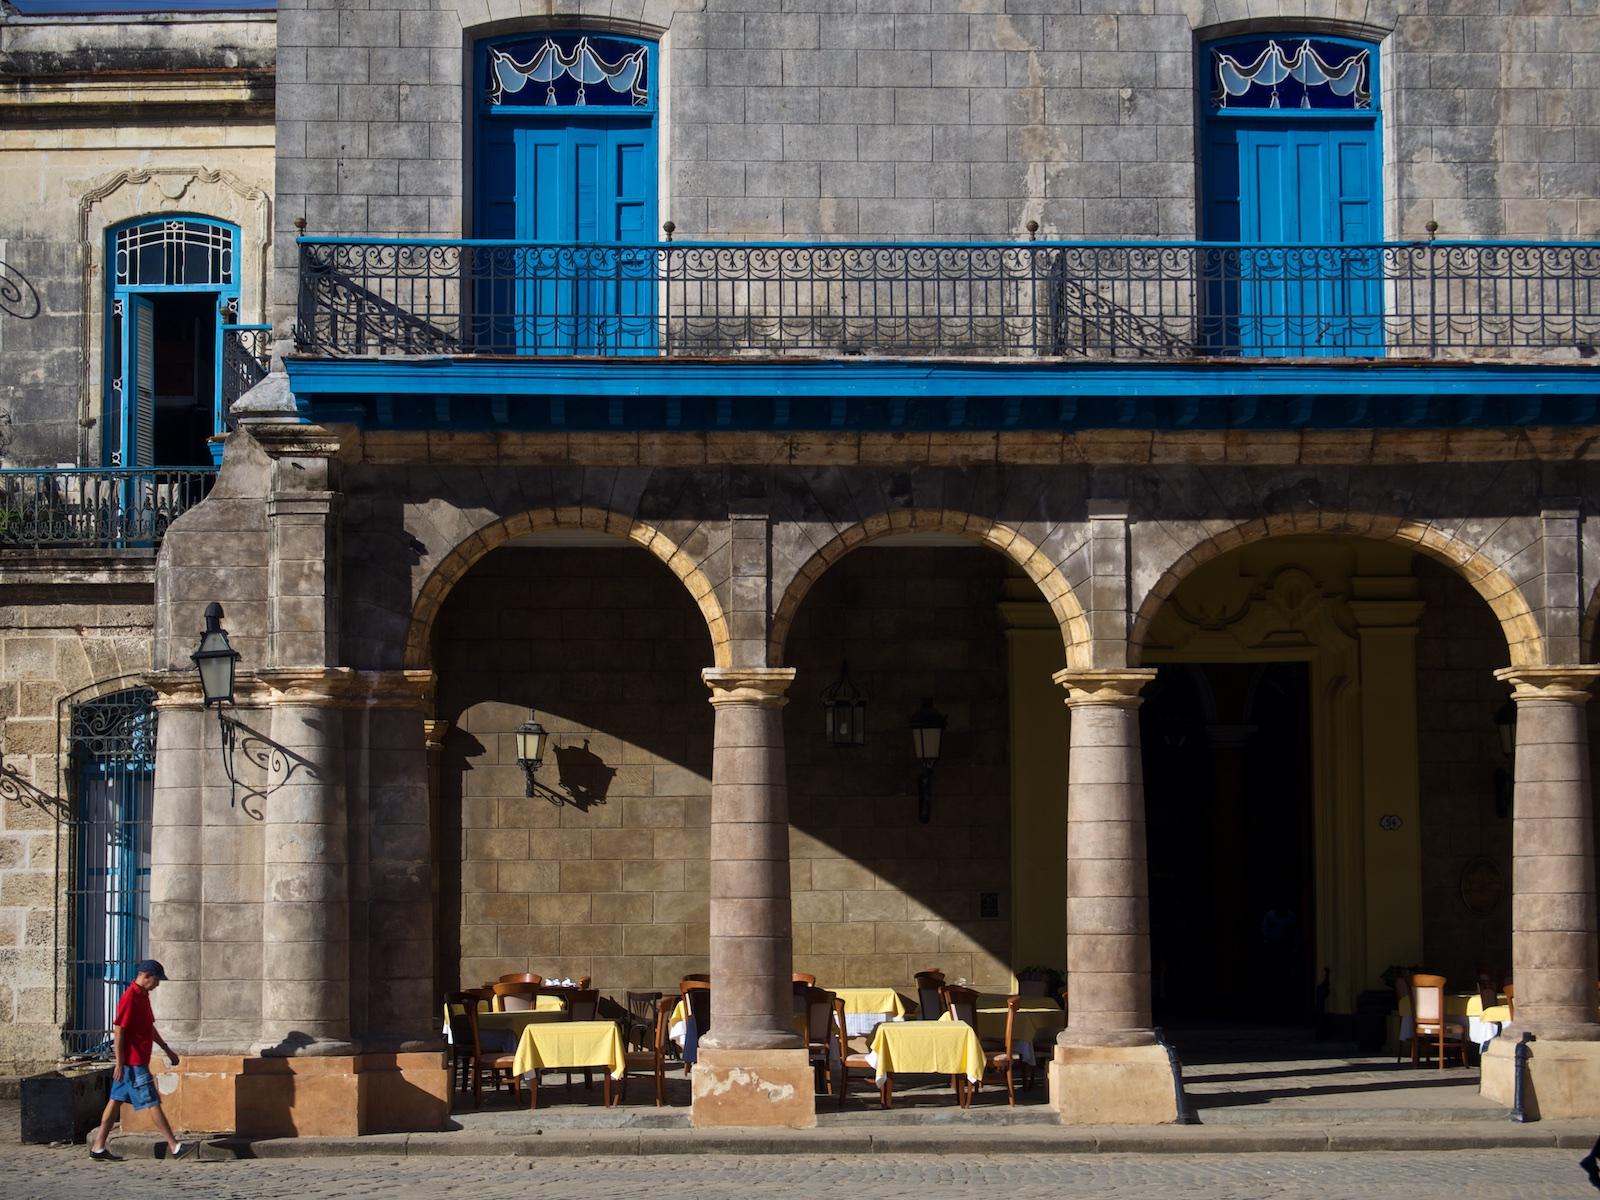 Restaurant on the Plaza in Morning Light, Havana Cuba. Photo by Derrick Story.